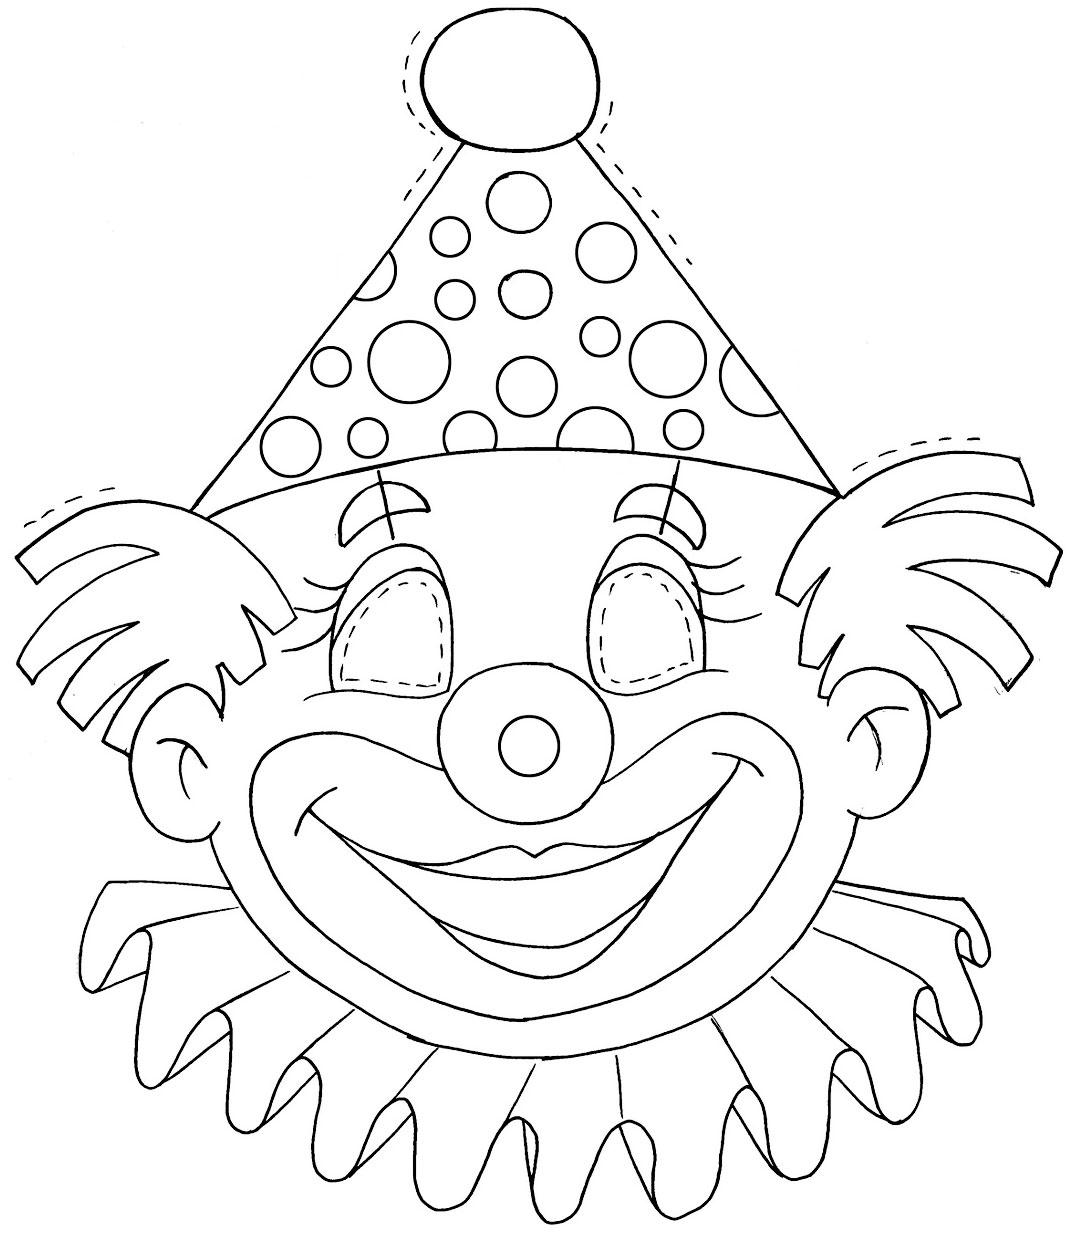 Antifaz de carnaval para colorear - Dibujos para colorear - IMAGIXS